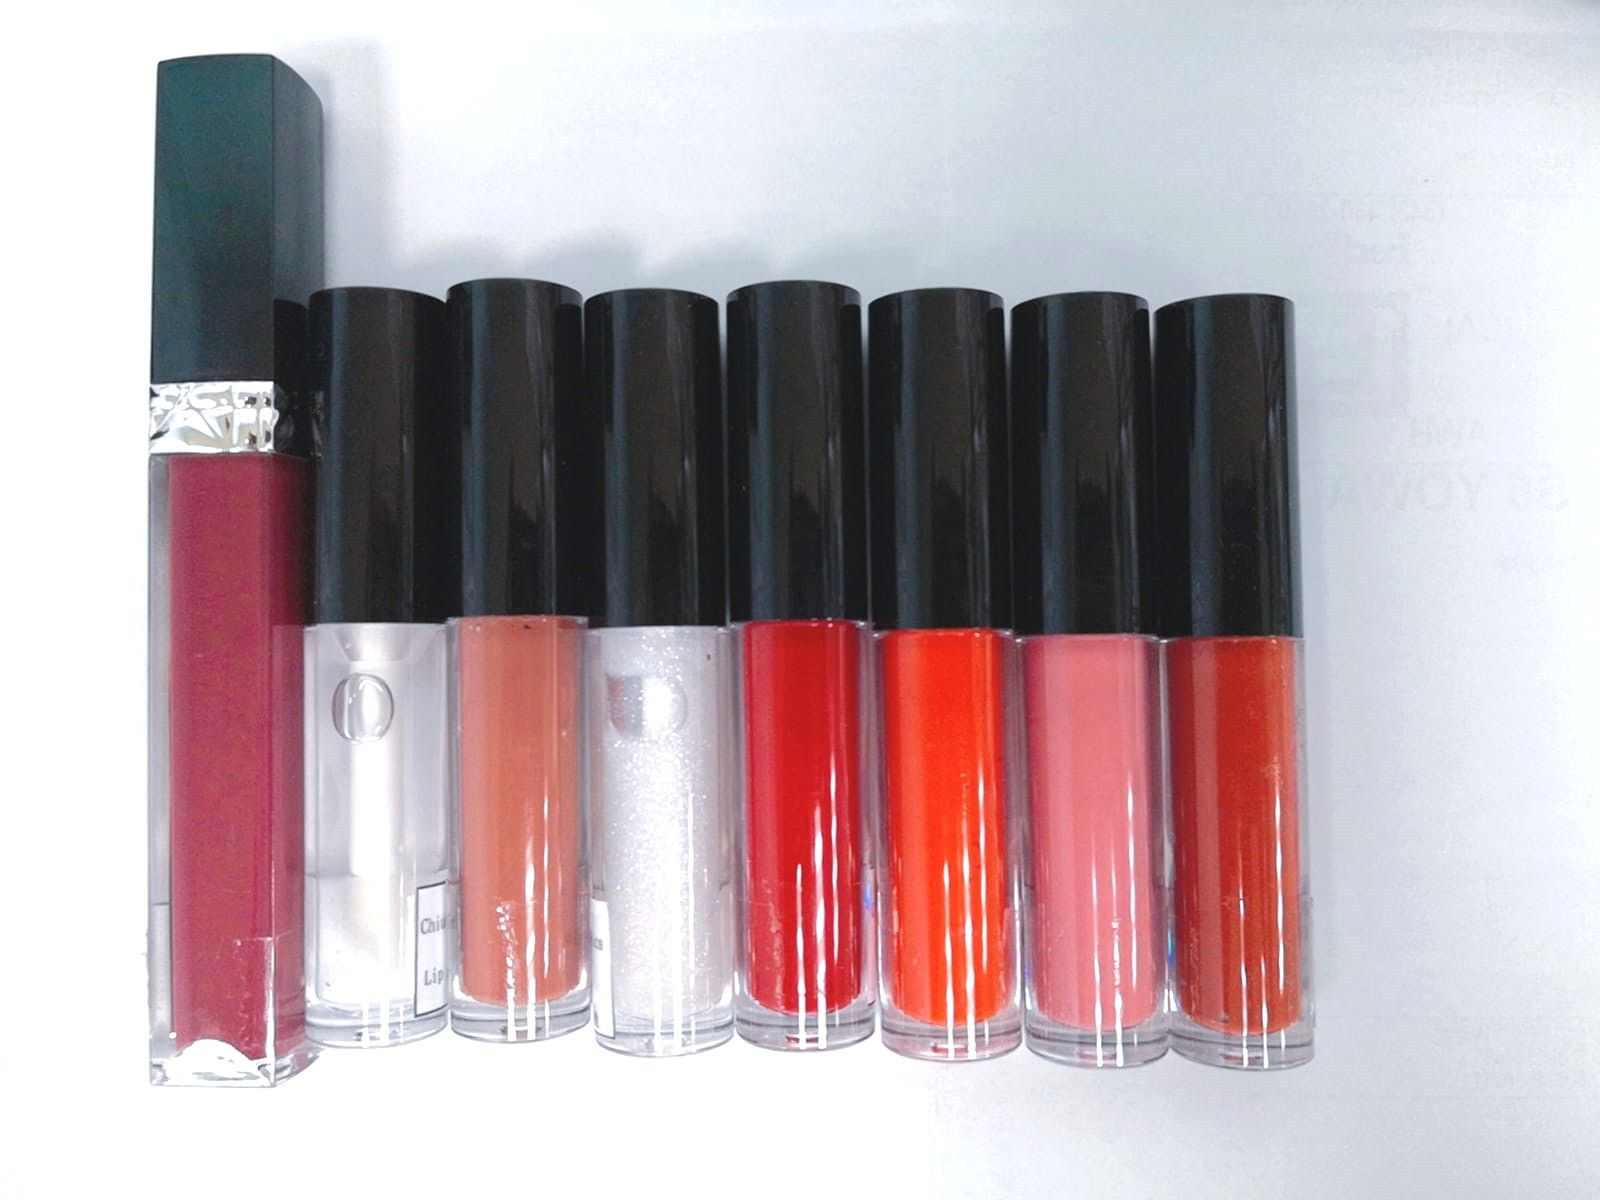 Customized lip gloss, private label lip gloss